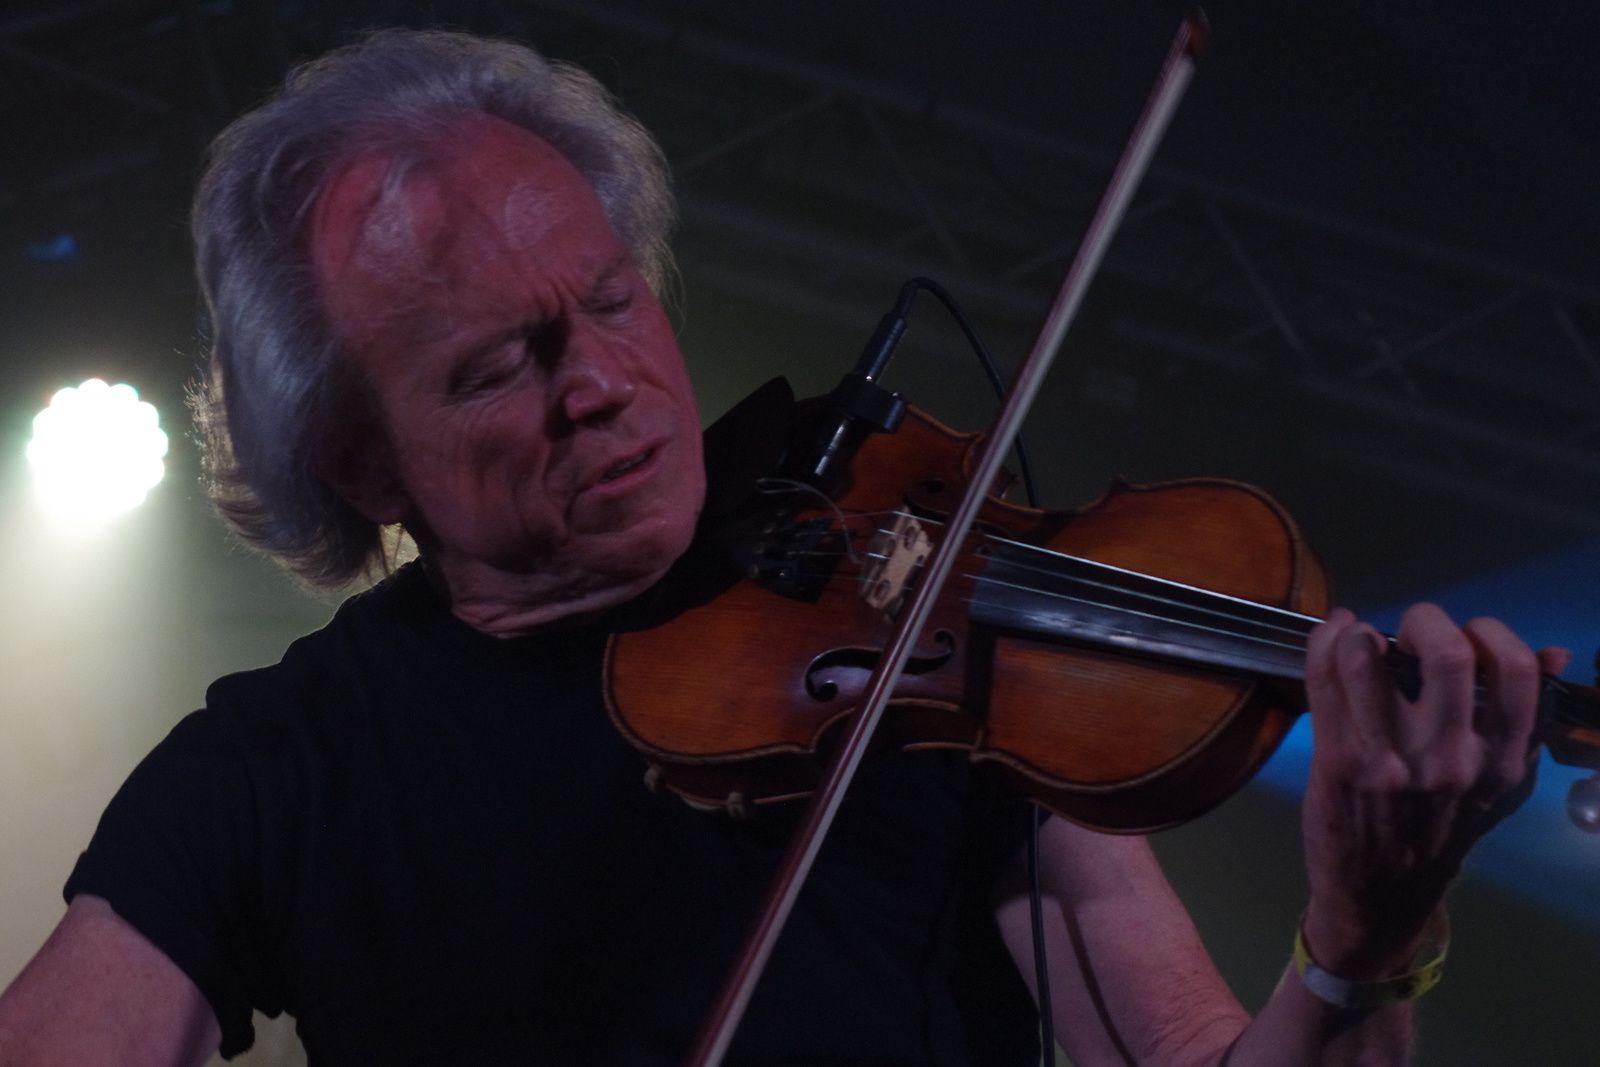 Tom Rigney & Flambeau - 31 mai 2014 - Duvel Blues, Puurs (B)